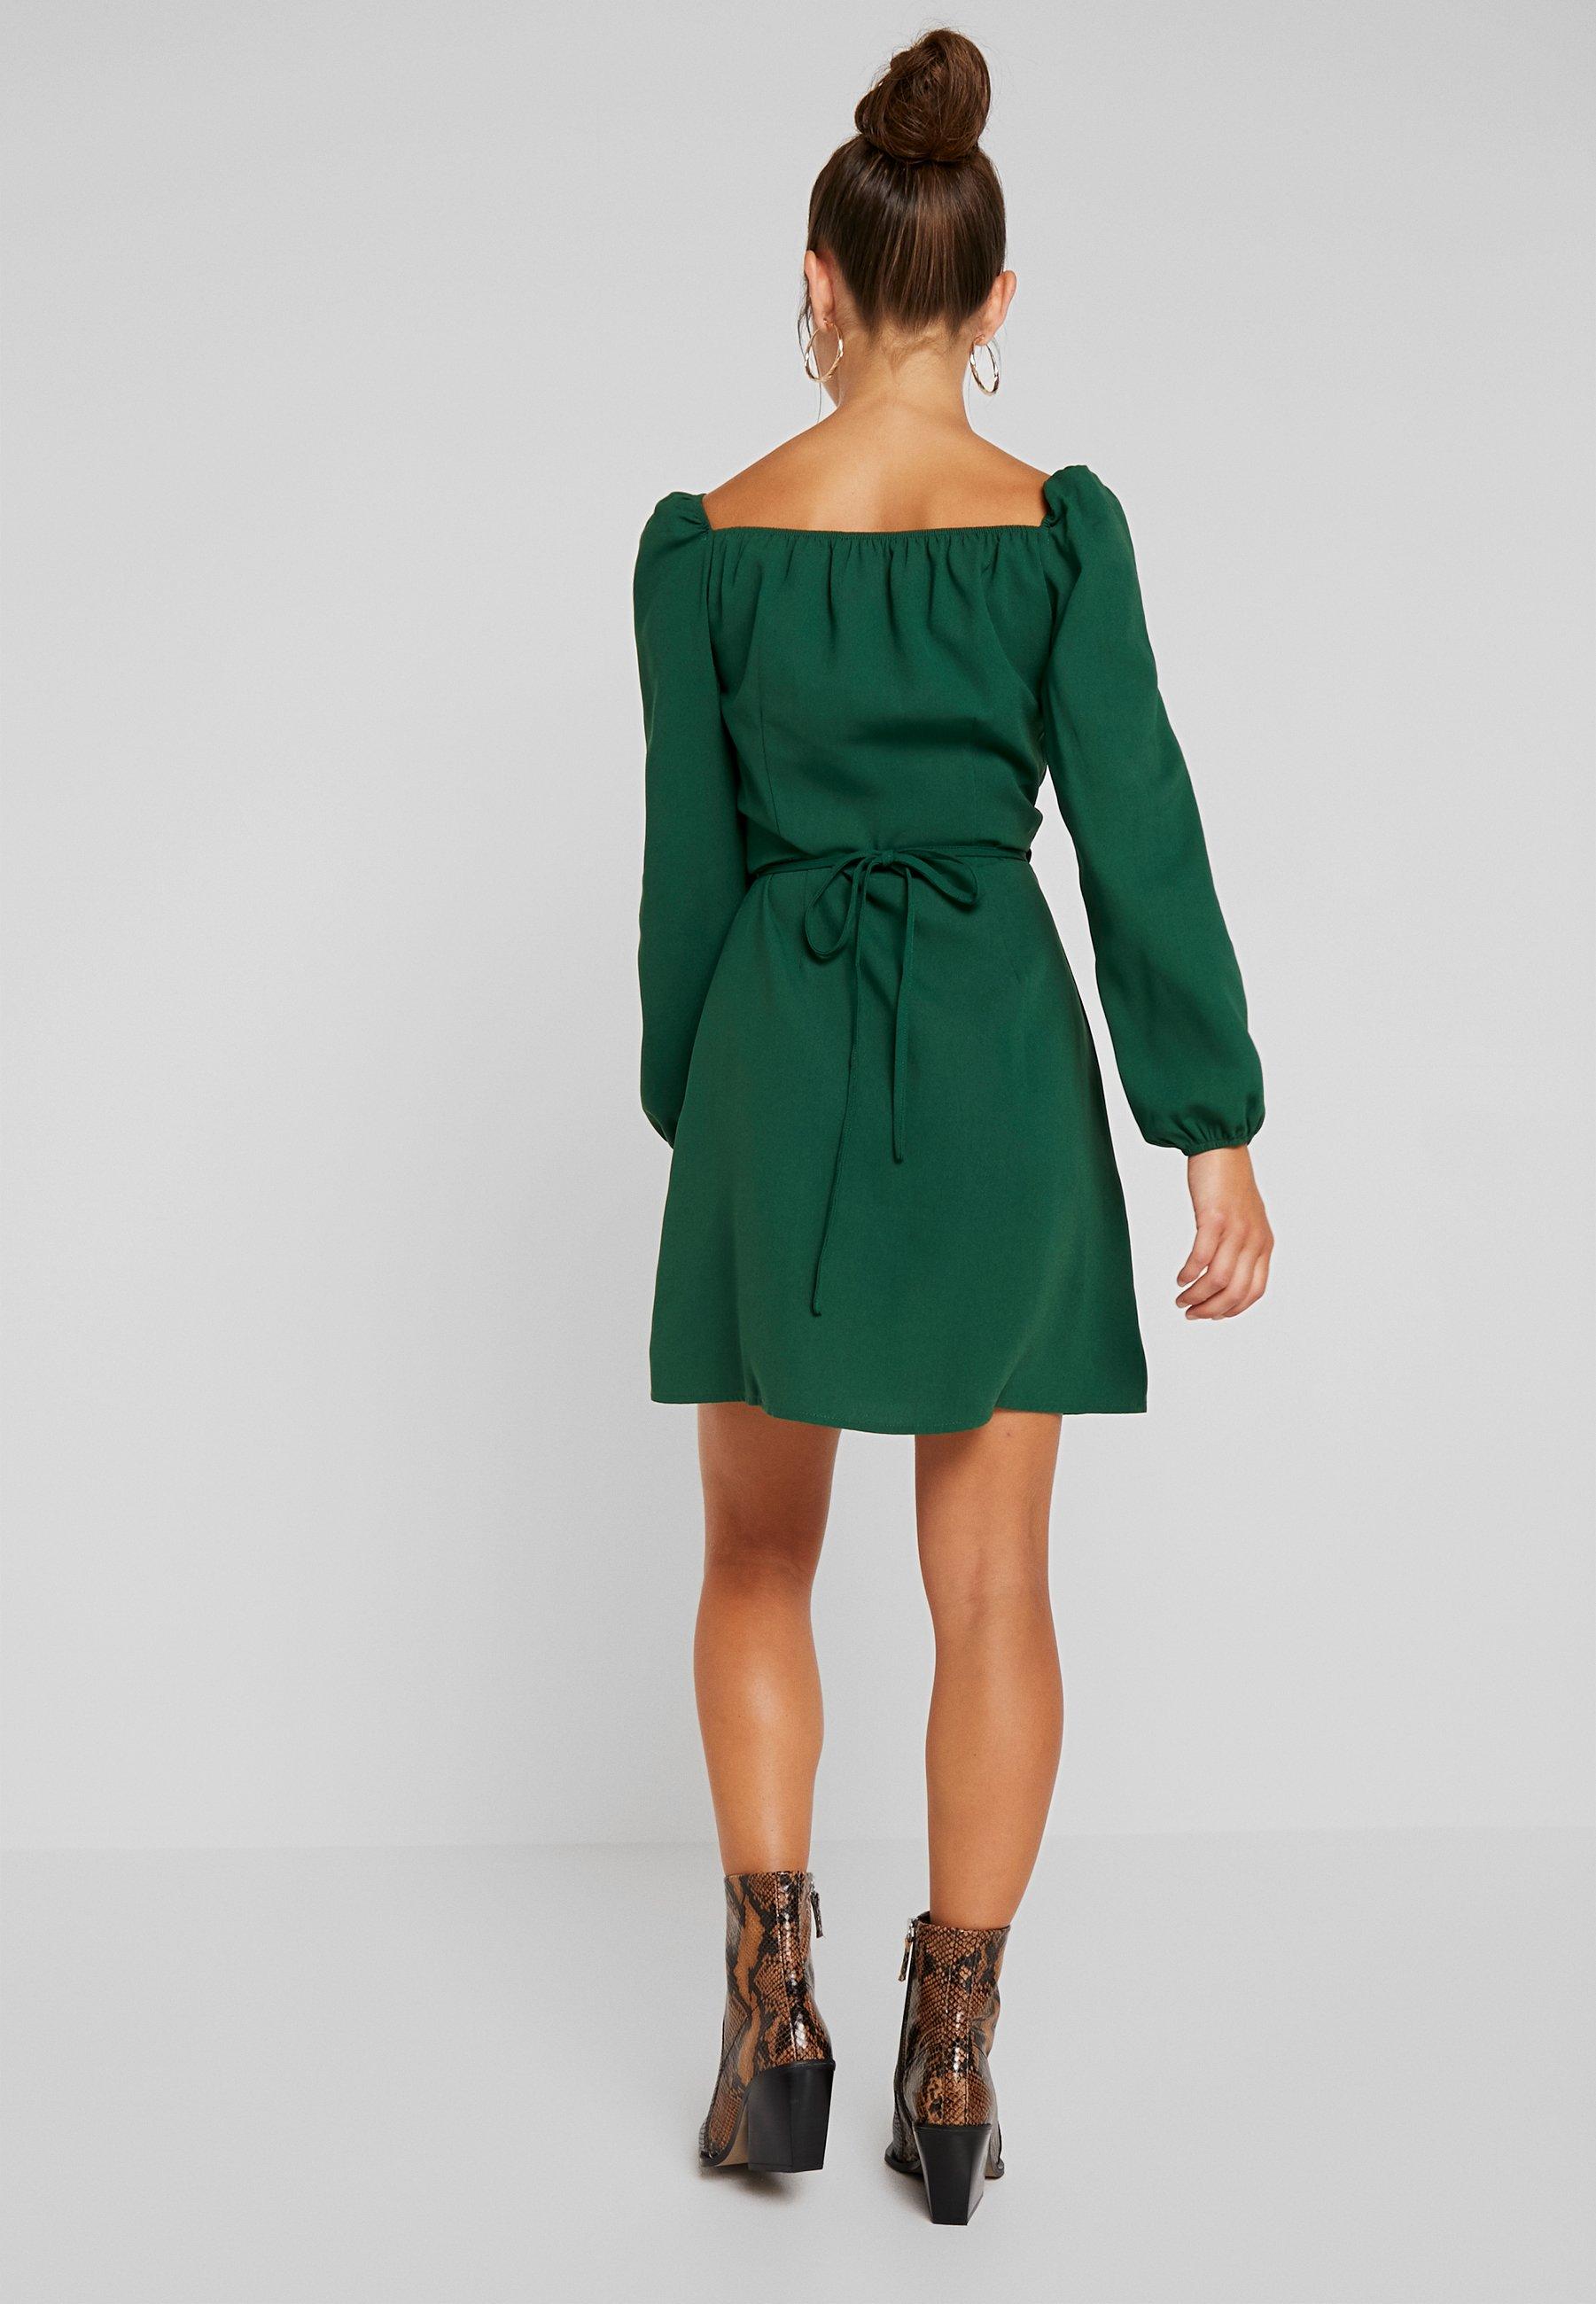 Petite Green Glamorous Petite Glamorous Robe D'étéDark NnOm8yv0w